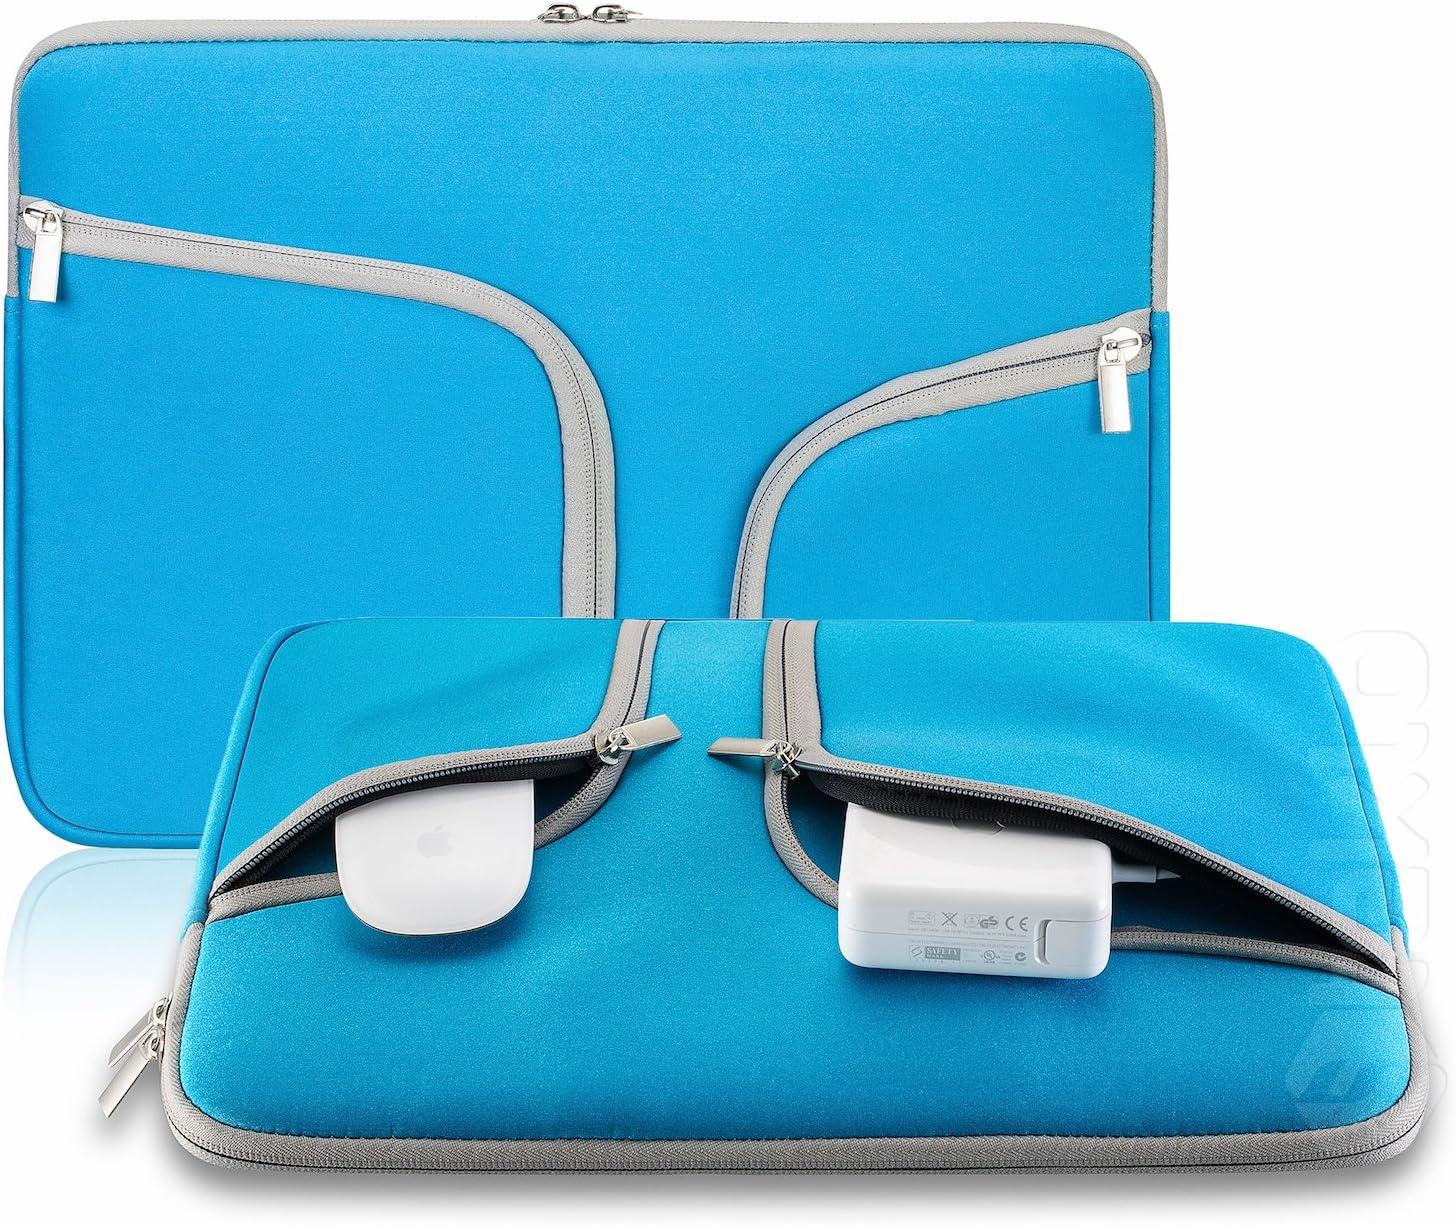 Steklo - Aqua Blue Neoprene Soft Sleeve Case Bag for All Laptop 15-inch & MacBook Pro 15.4